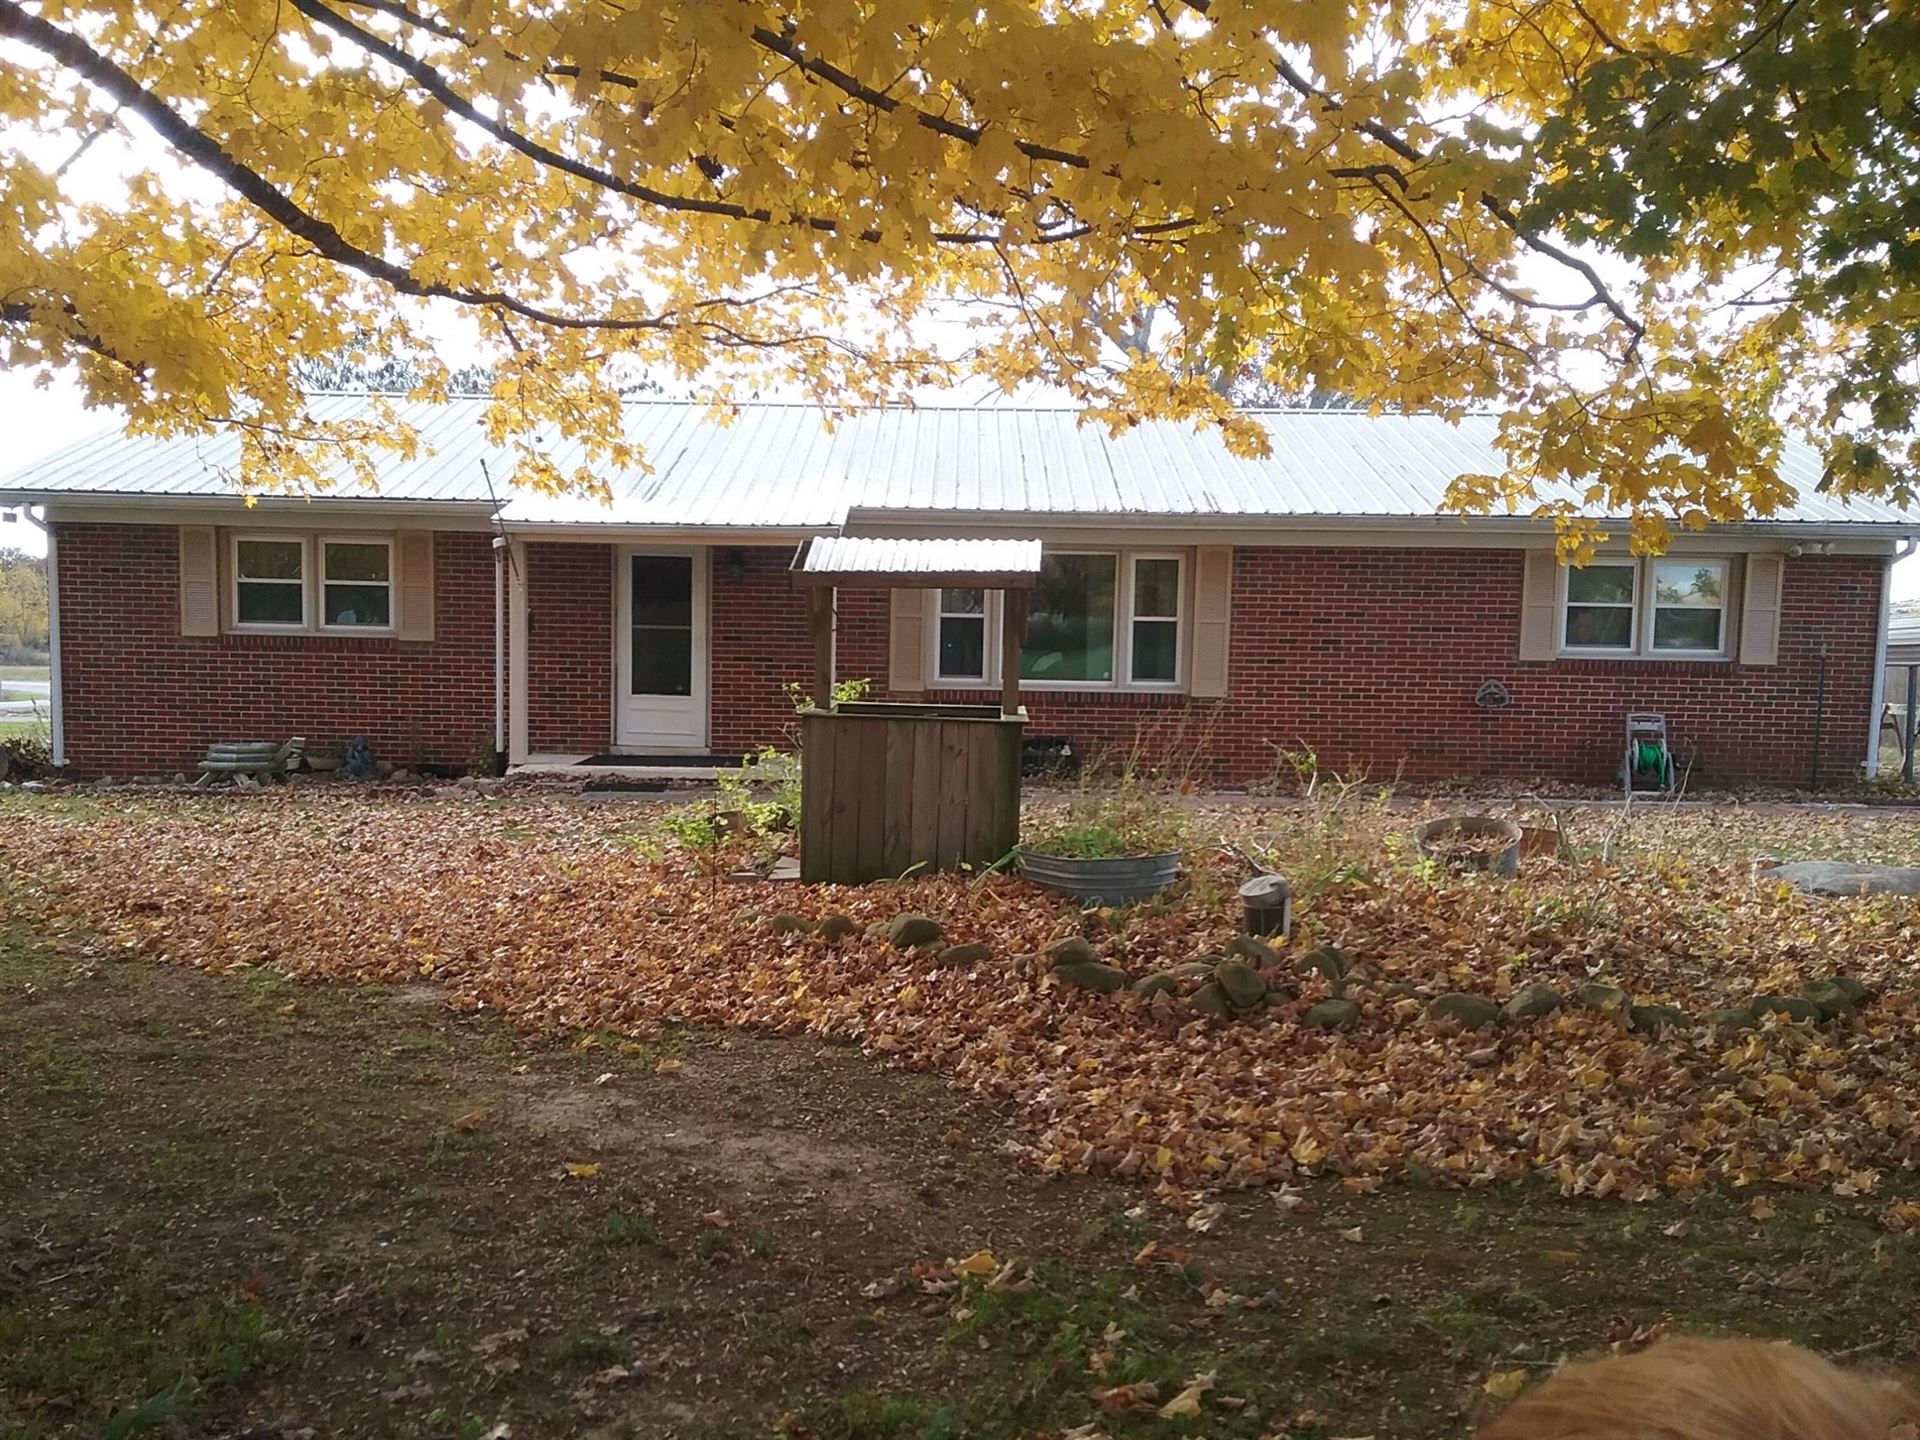 1786 Pratt Rd, Hillsboro, TN 37342 - MLS#: 2205199